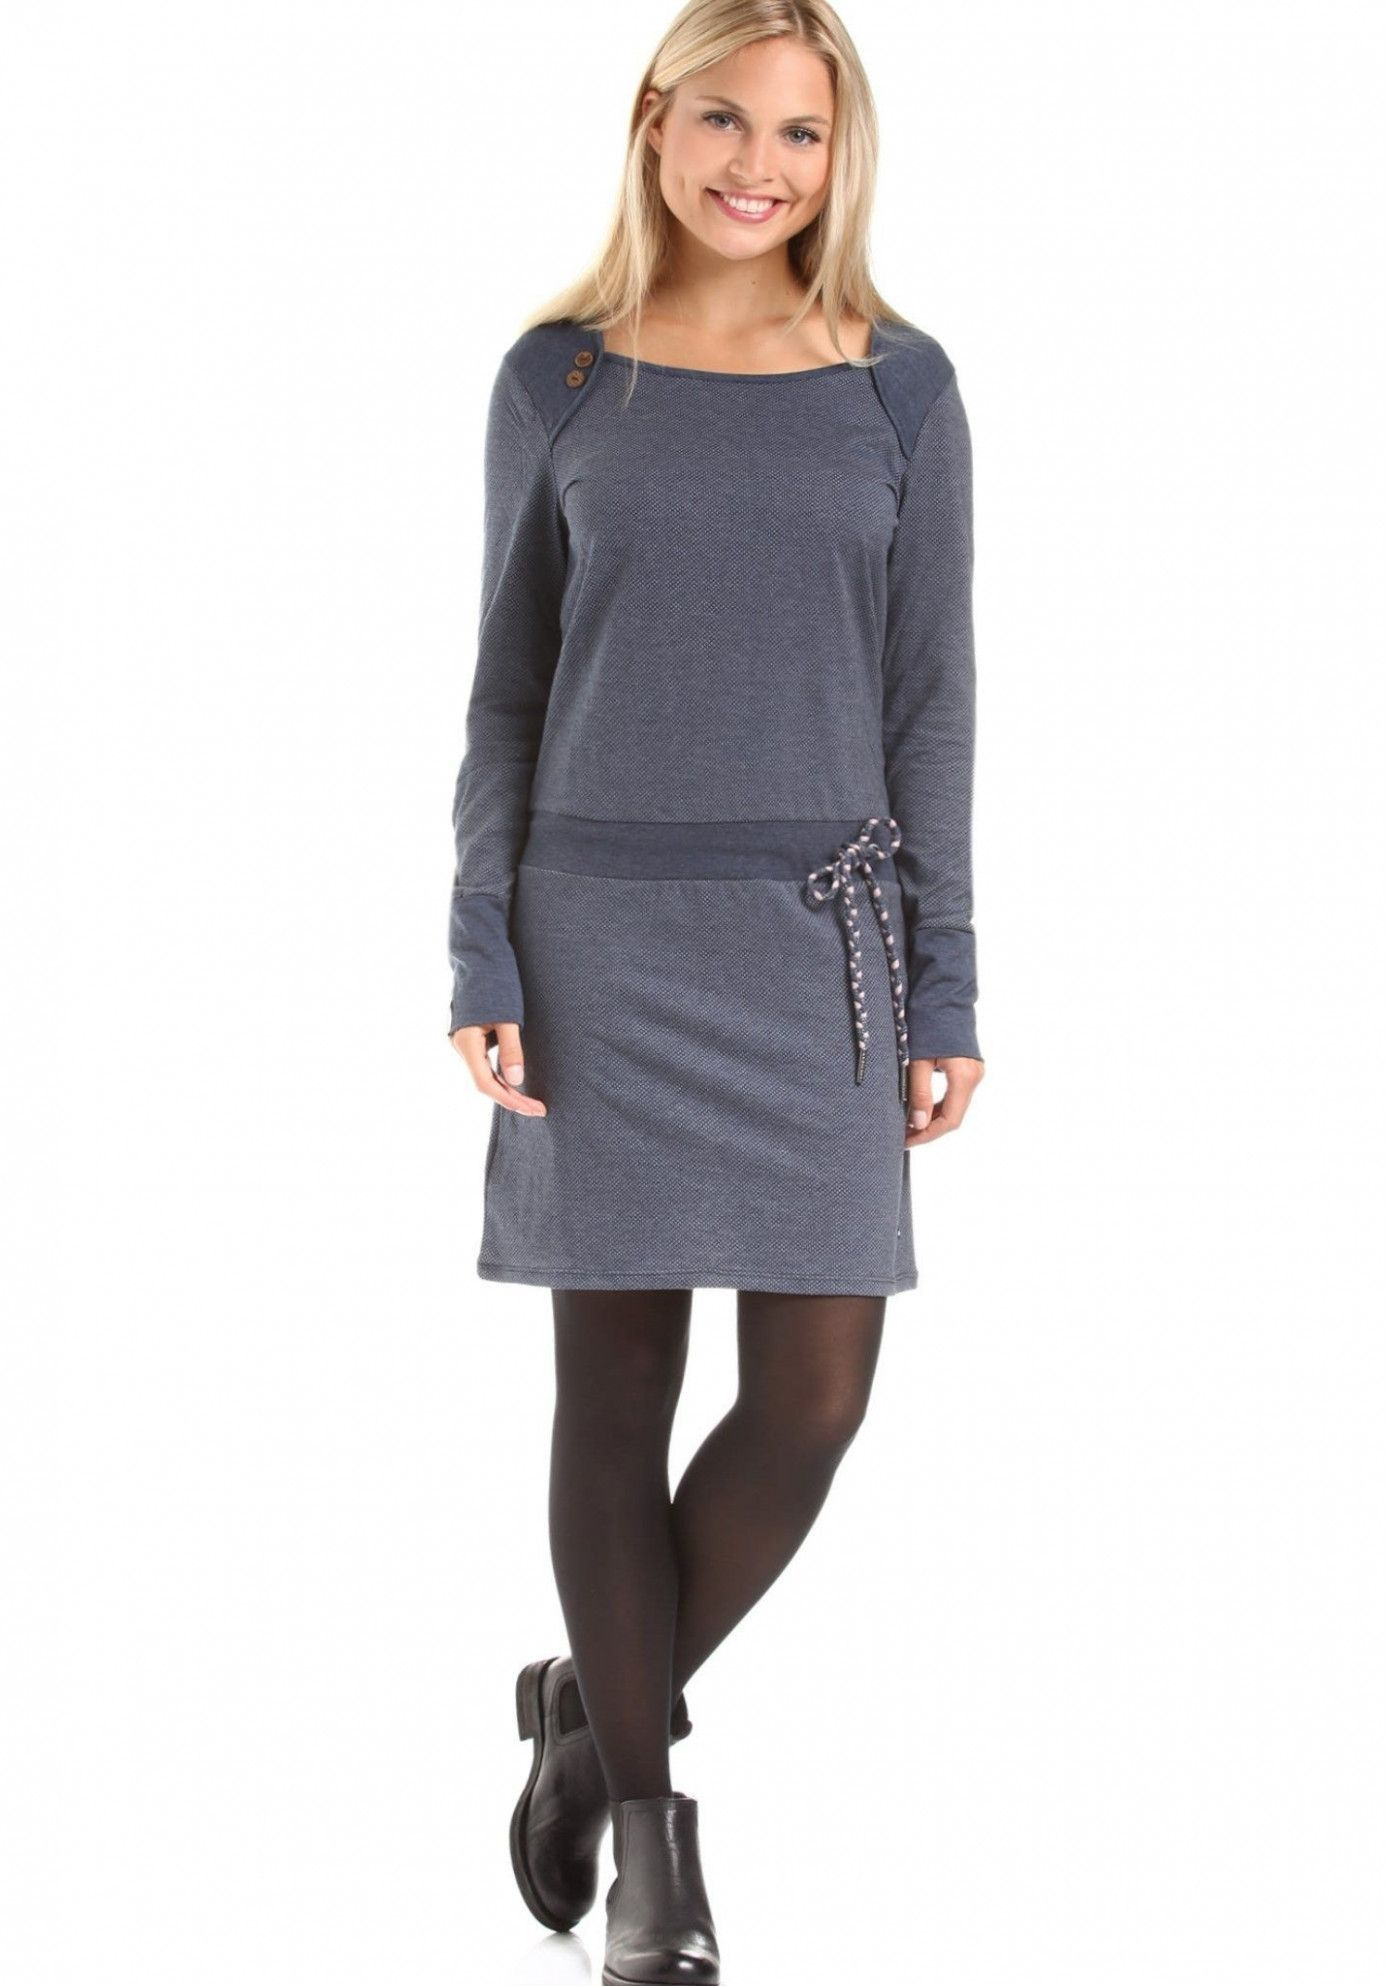 15 winterkleider damen | clothes, sweater dress, cold